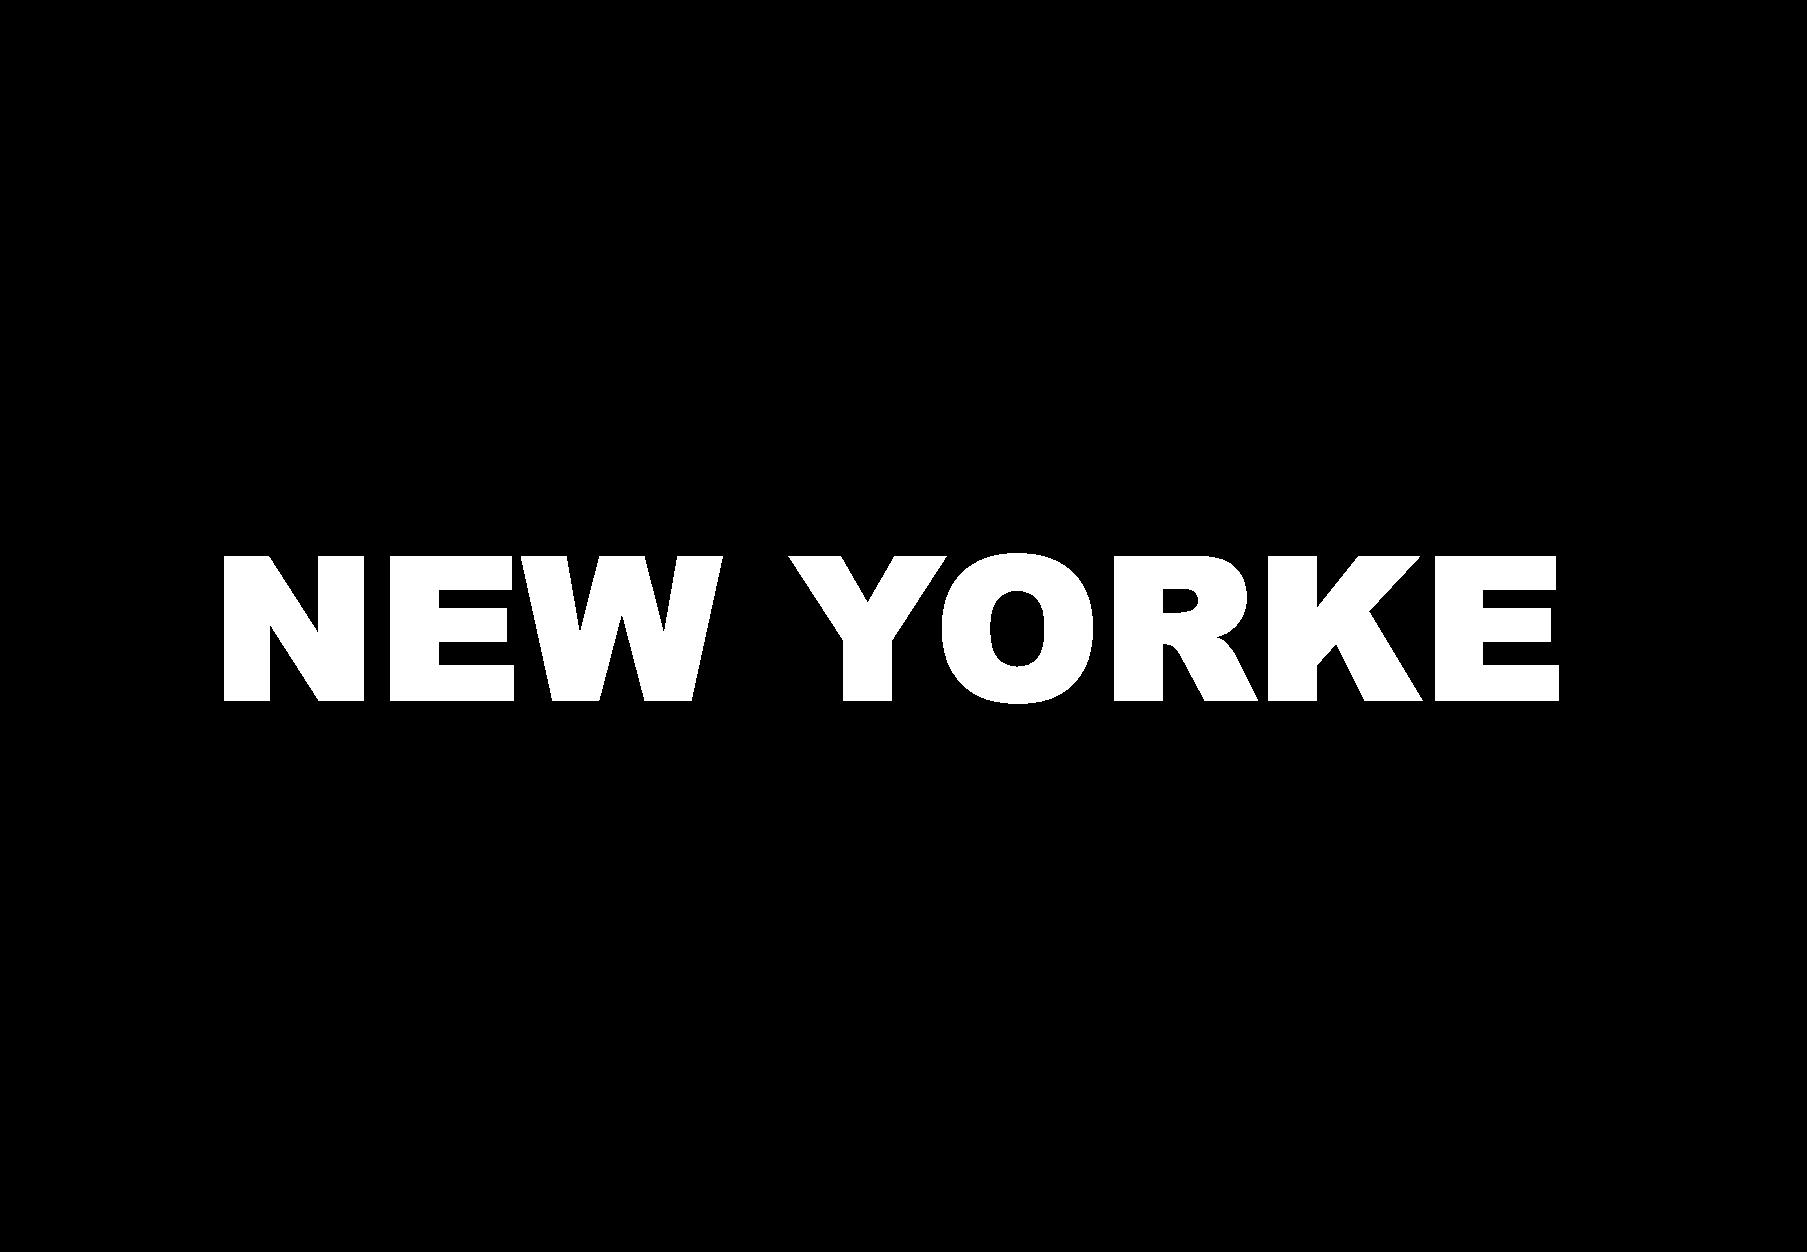 NEW YORKE